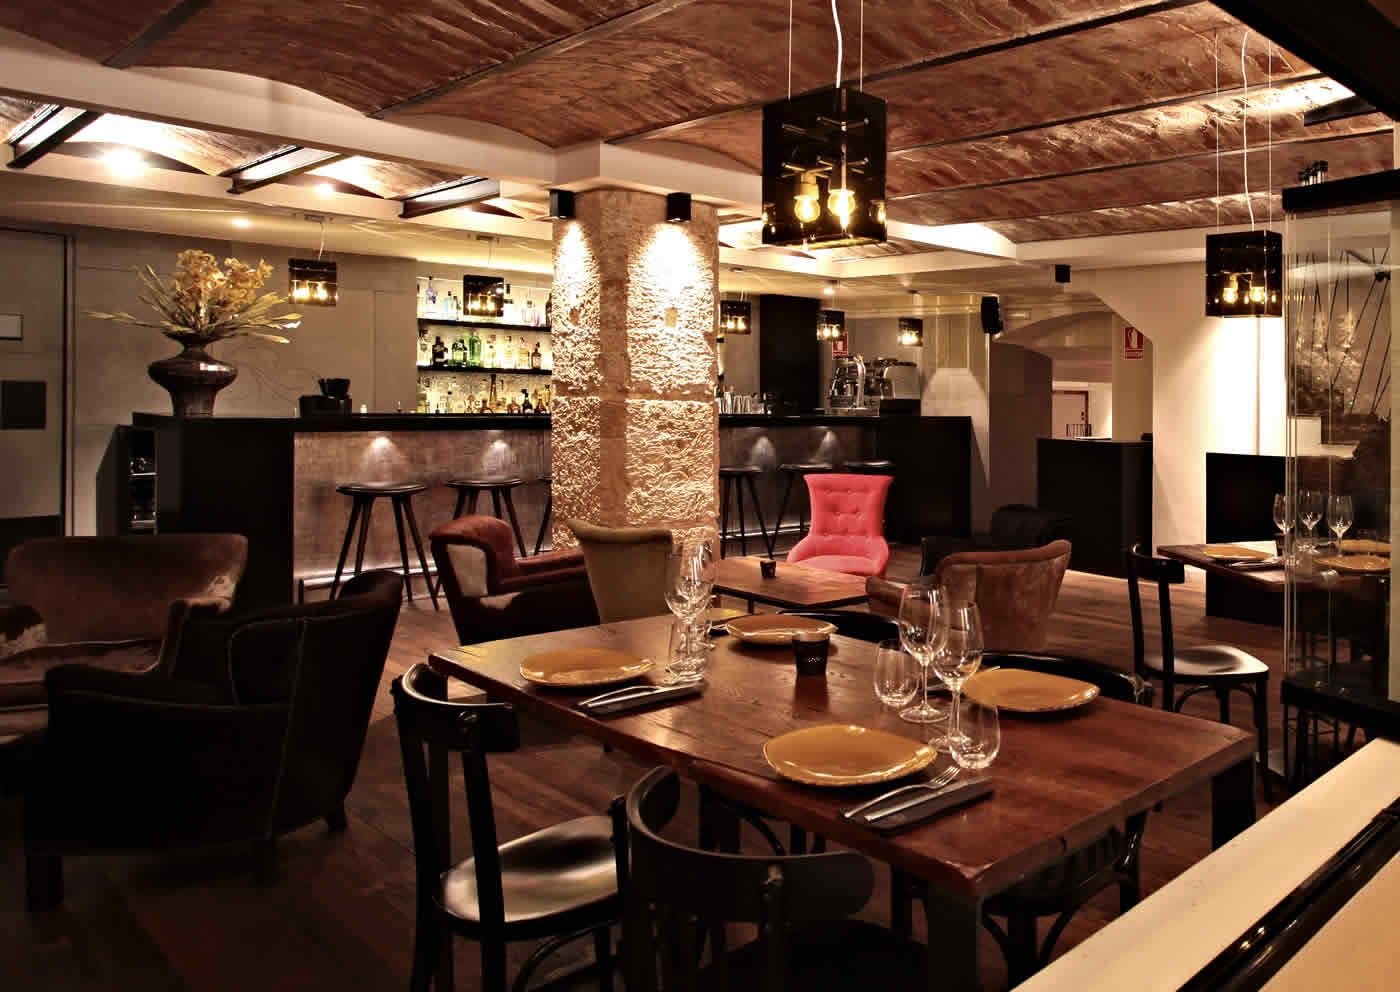 Pin on Restaurants & Bars